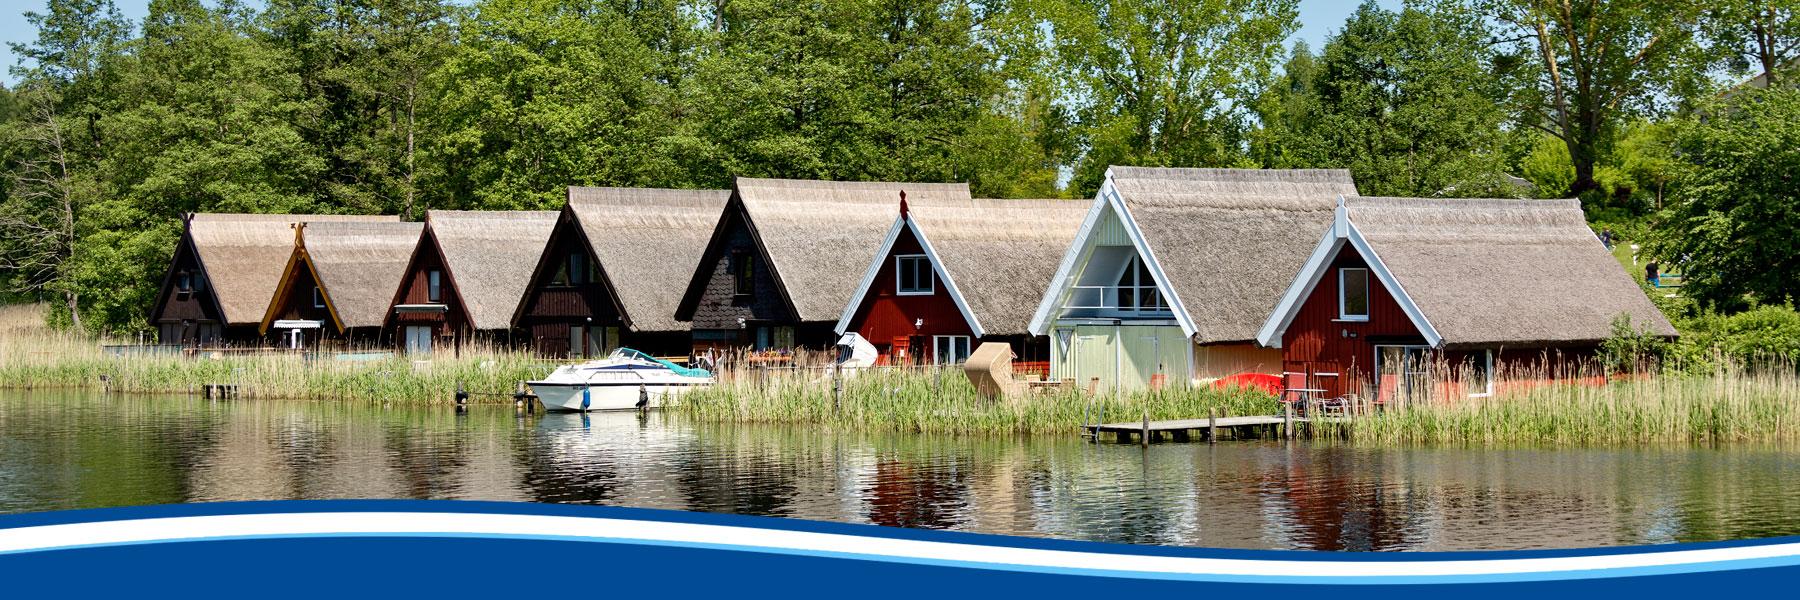 Bootshäuser - Blau Weisse Flotte Müritz & Seen in Waren